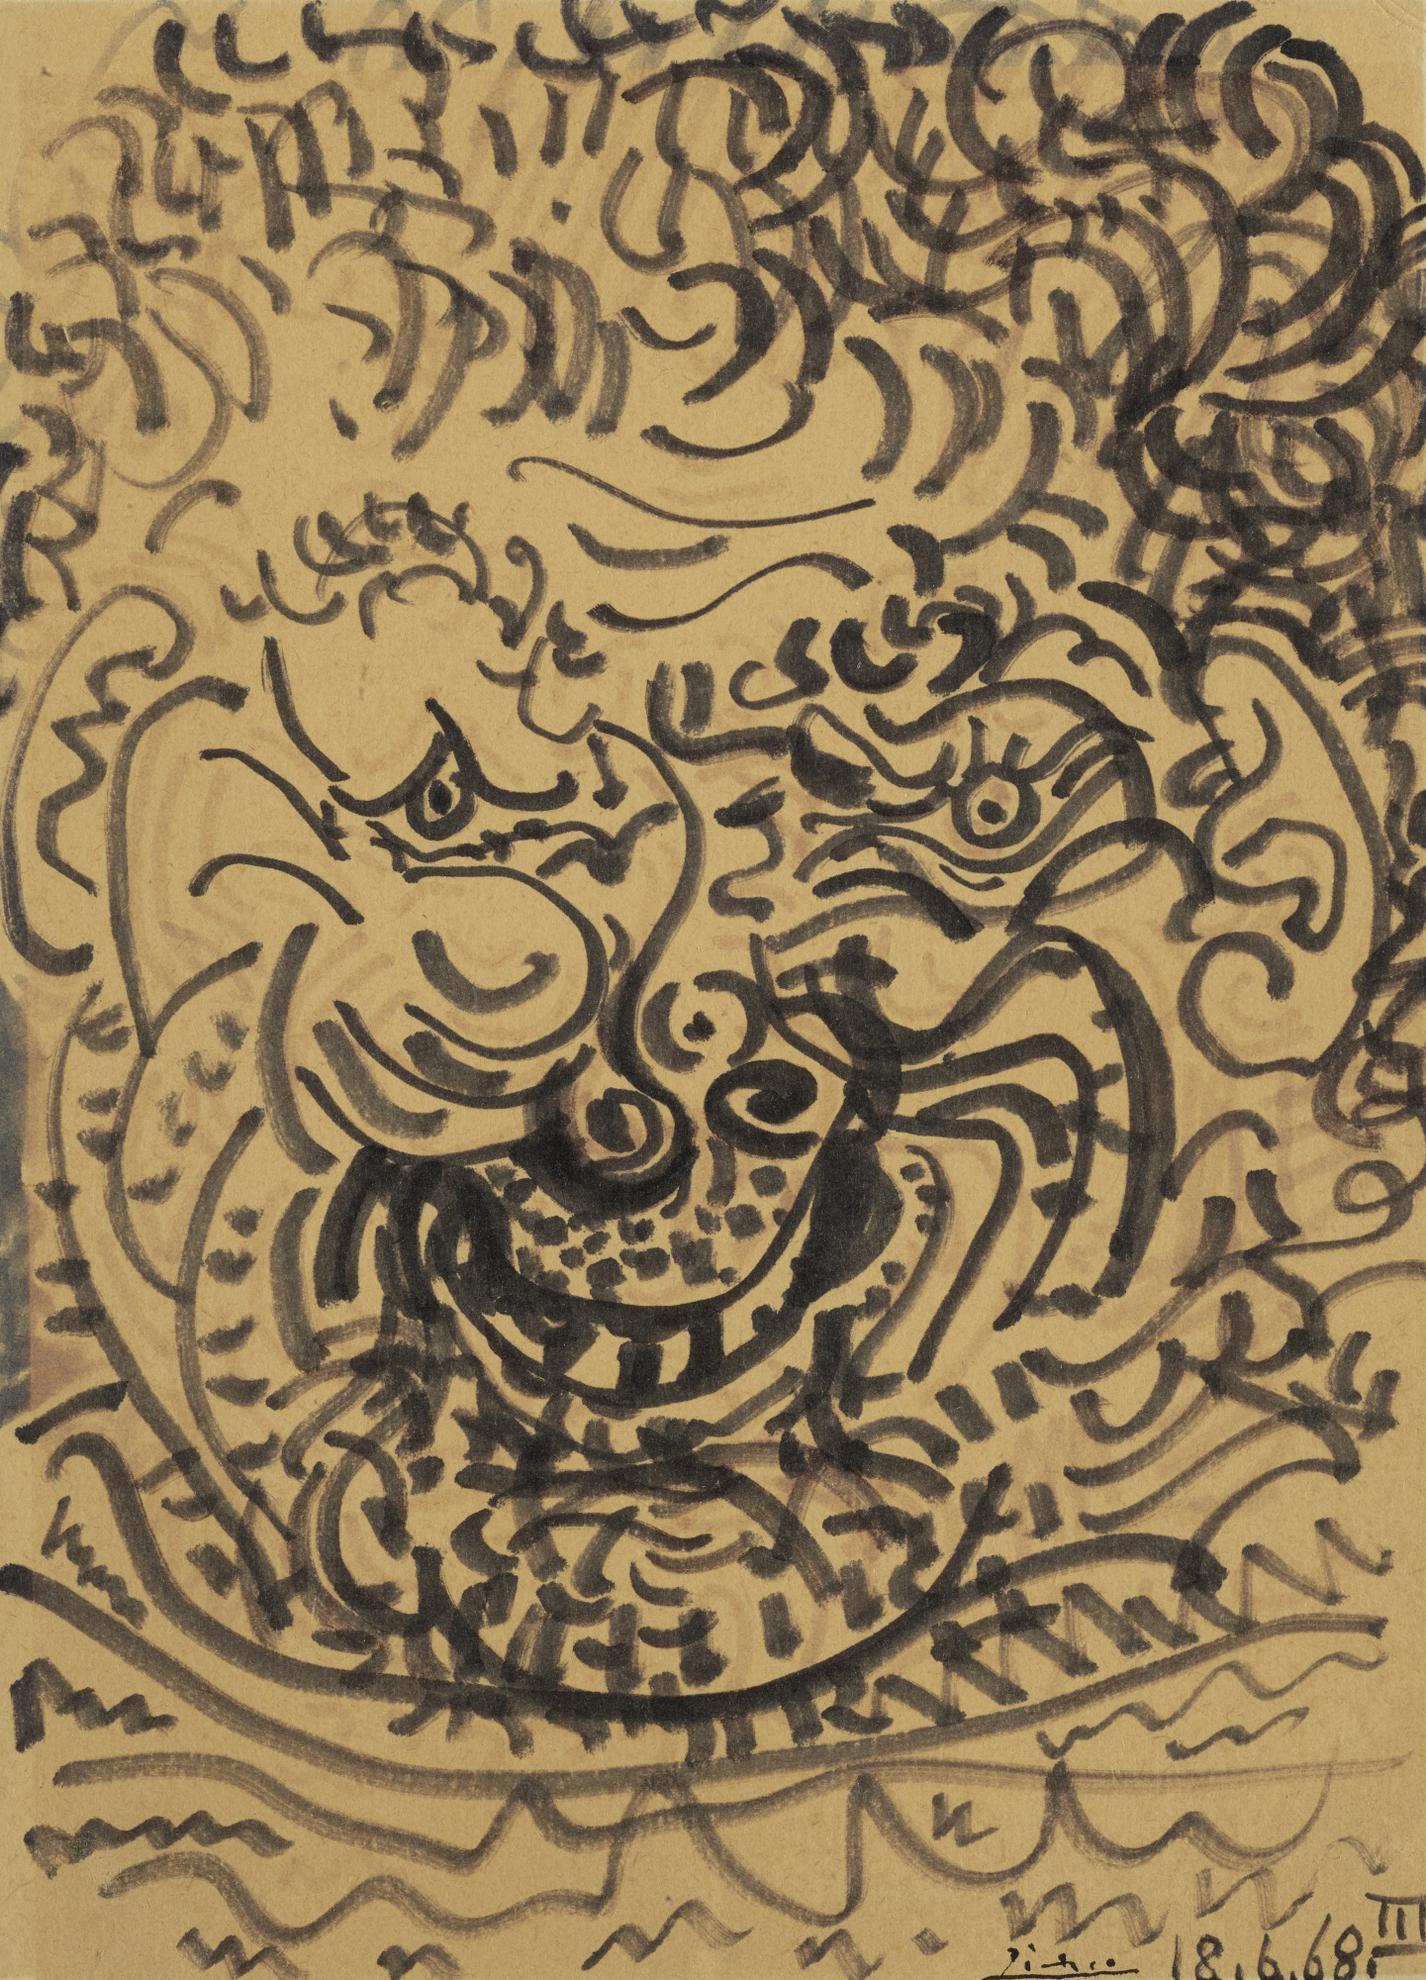 Pablo Picasso-Tete Dhomme Barbu-1968